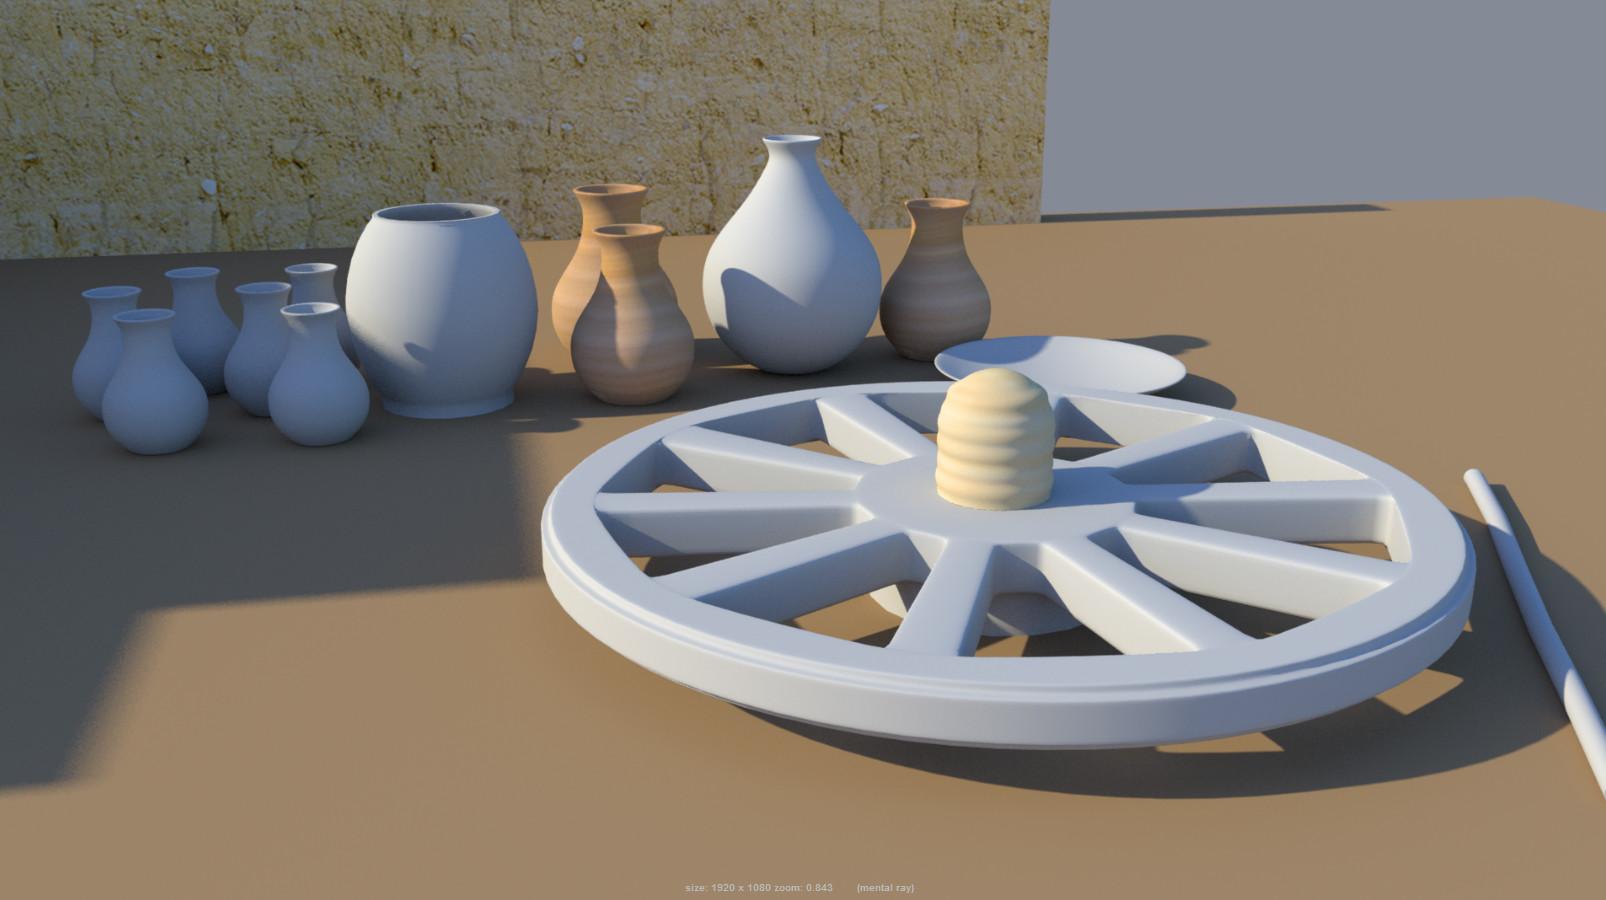 Rajesh sawant potters wheel 2